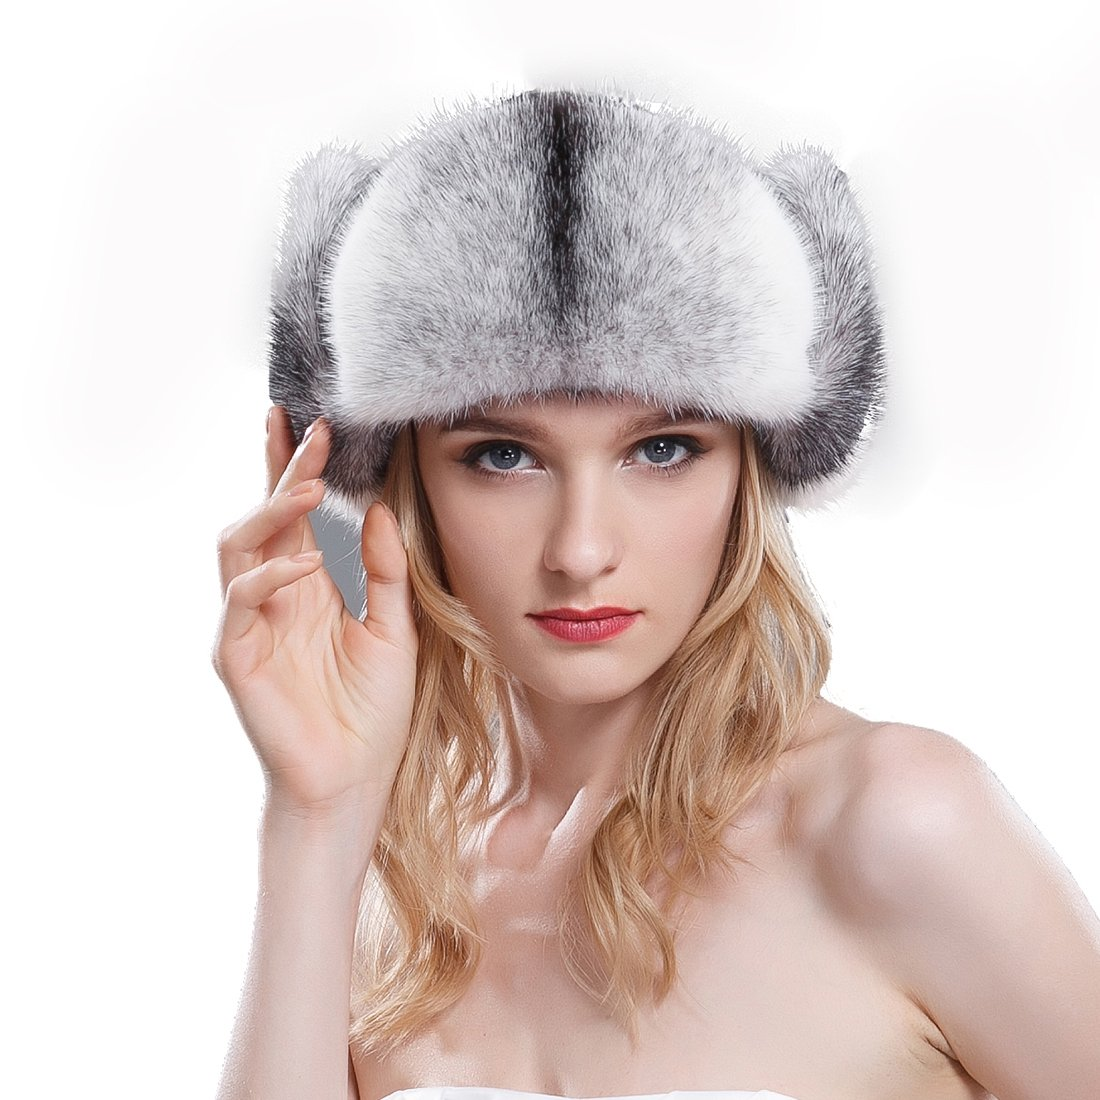 URSFUR Women's Mink Fur & Leather Trapper Hats (One Size, Cross Mink Natural Color)